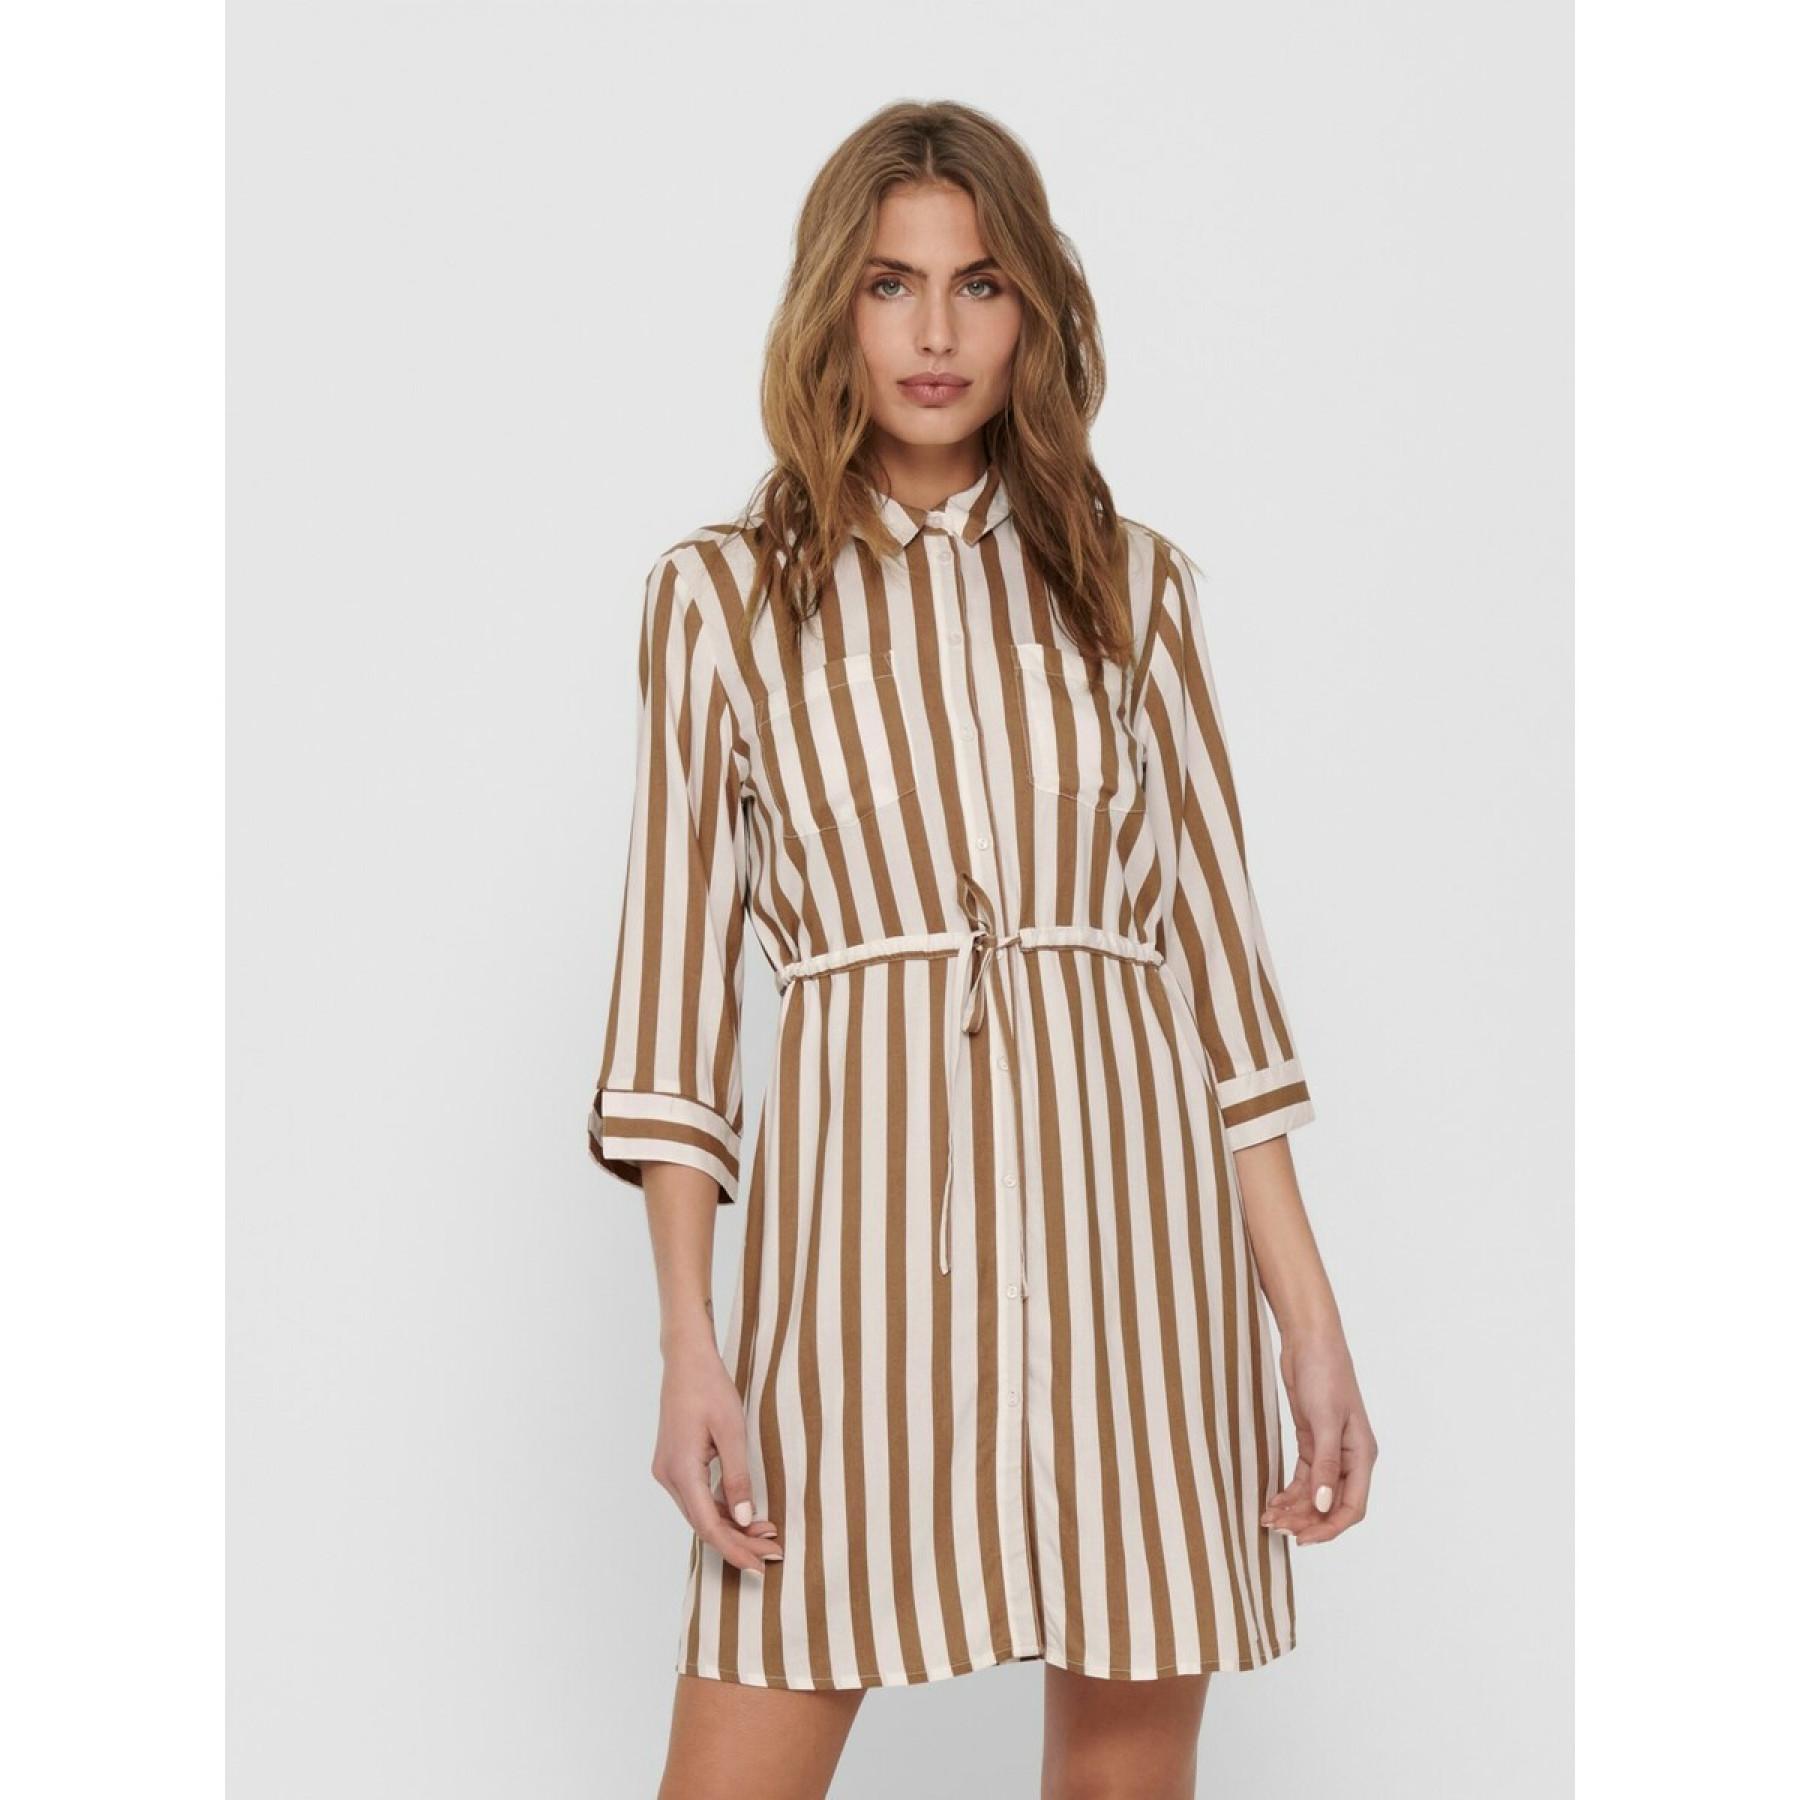 Only Tamari women's shirt dress with 3/4 sleeves